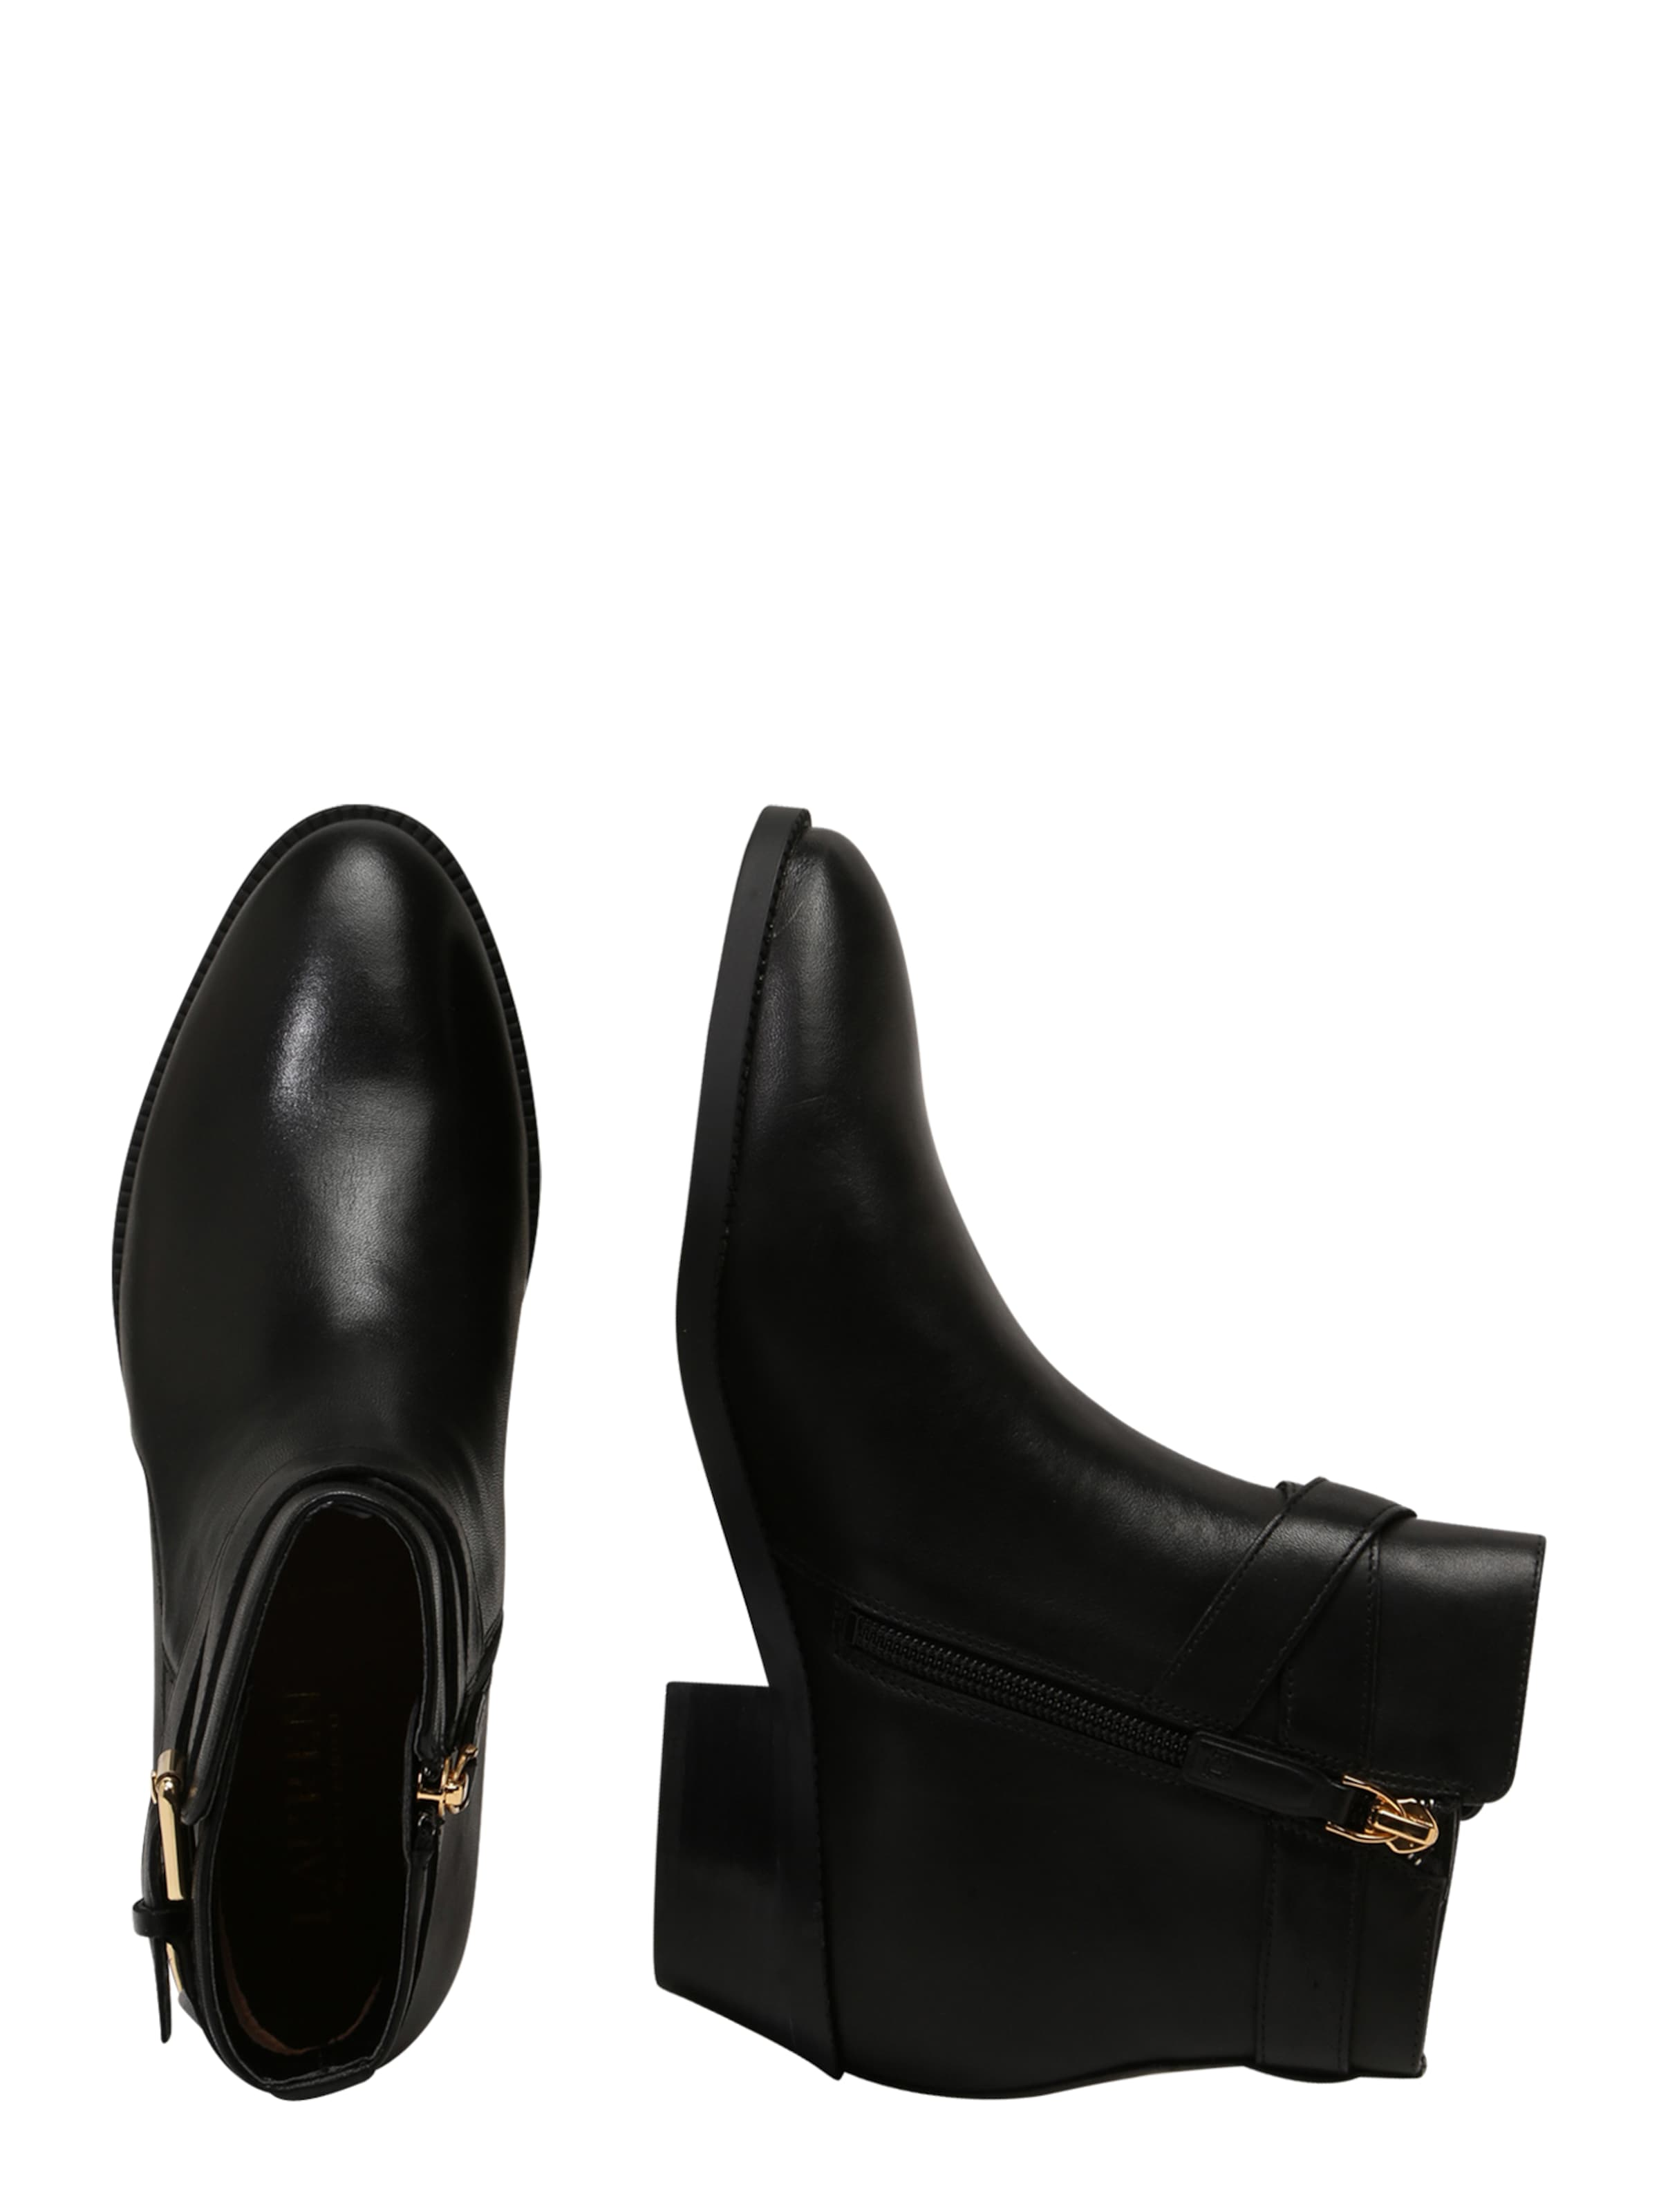 Boots Ralph En casual' 'egerton Lauren boots Noir jA5R3Lq4